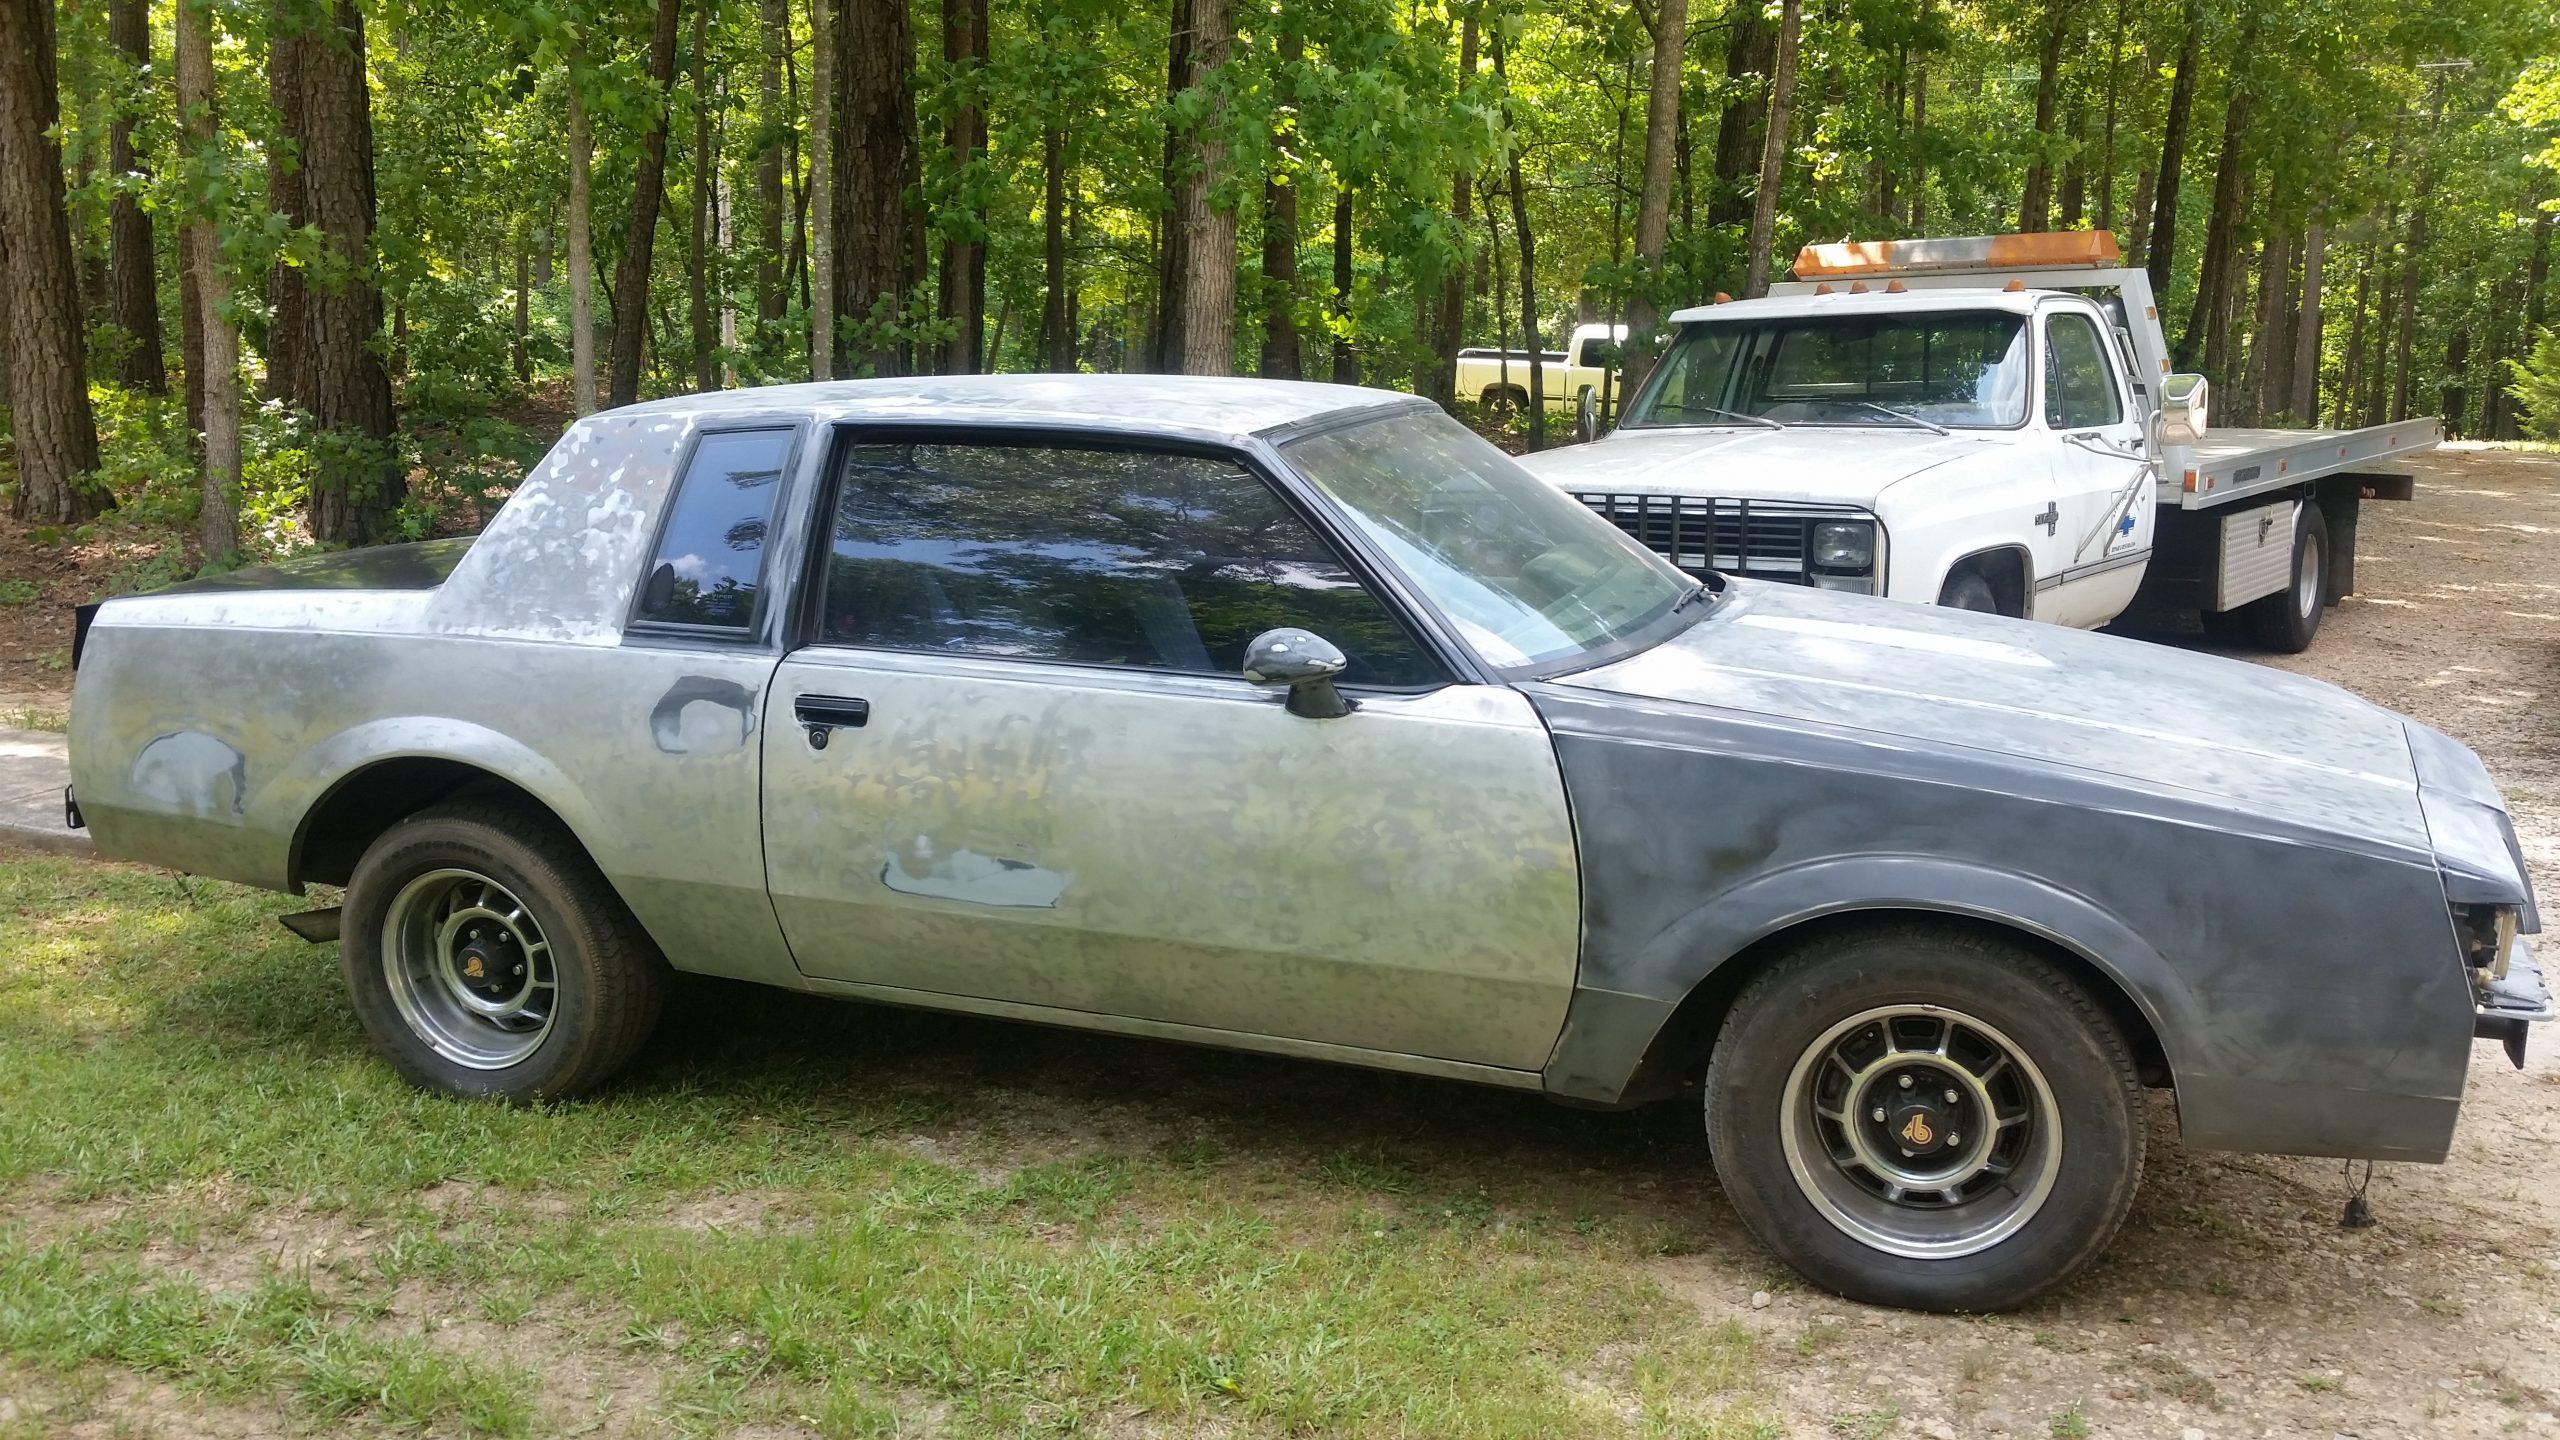 1987 Buick Grand National bare metal